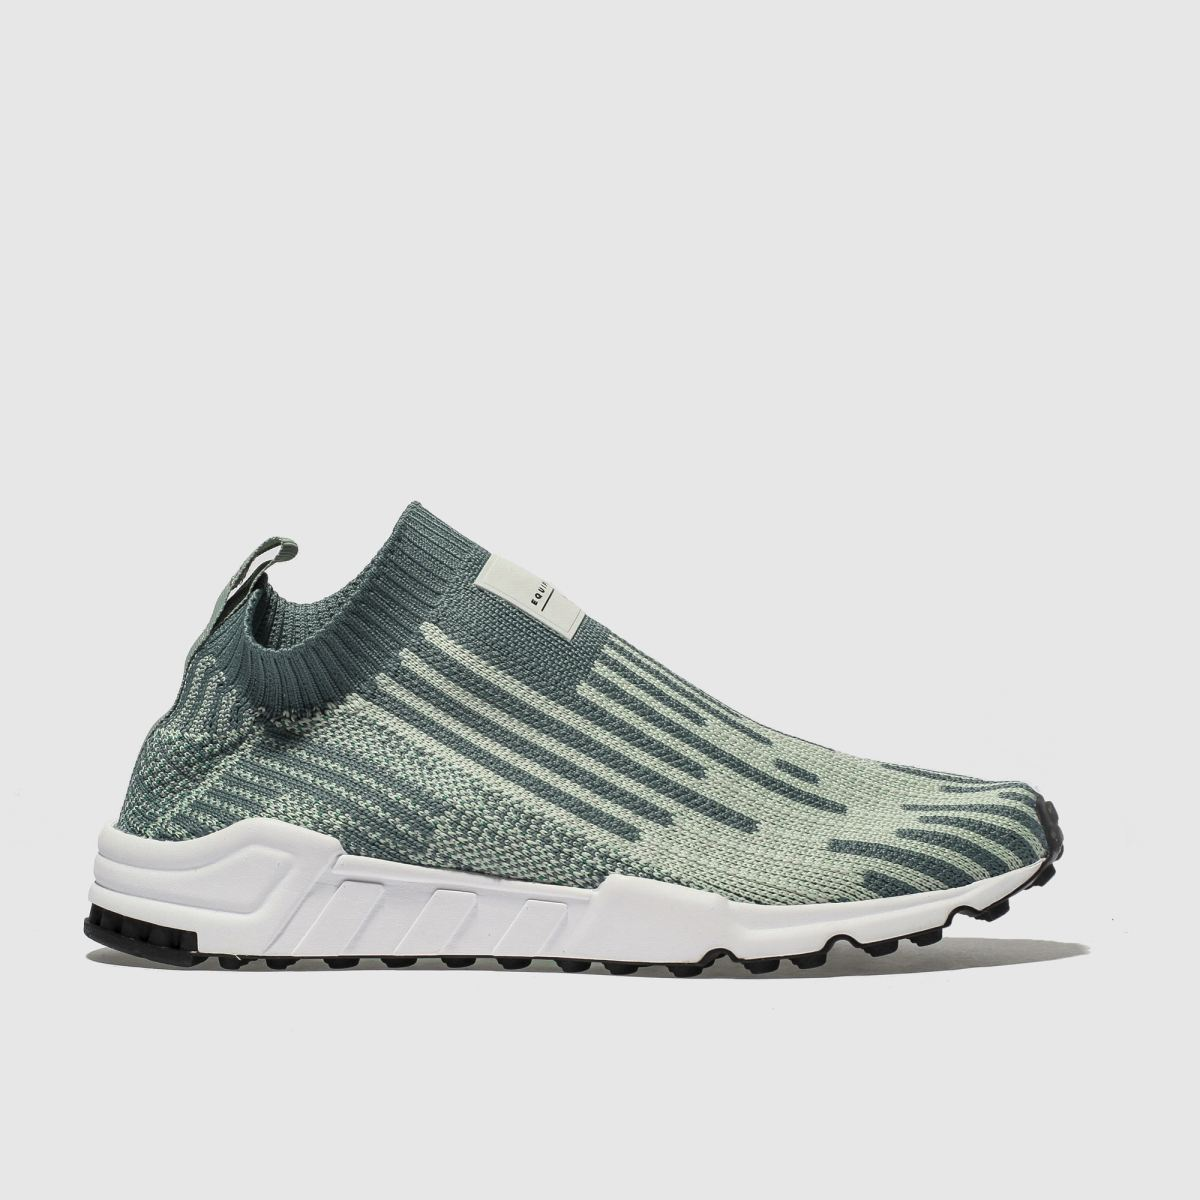 Adidas Green Eqt Support Primeknit 3/3 Trainers